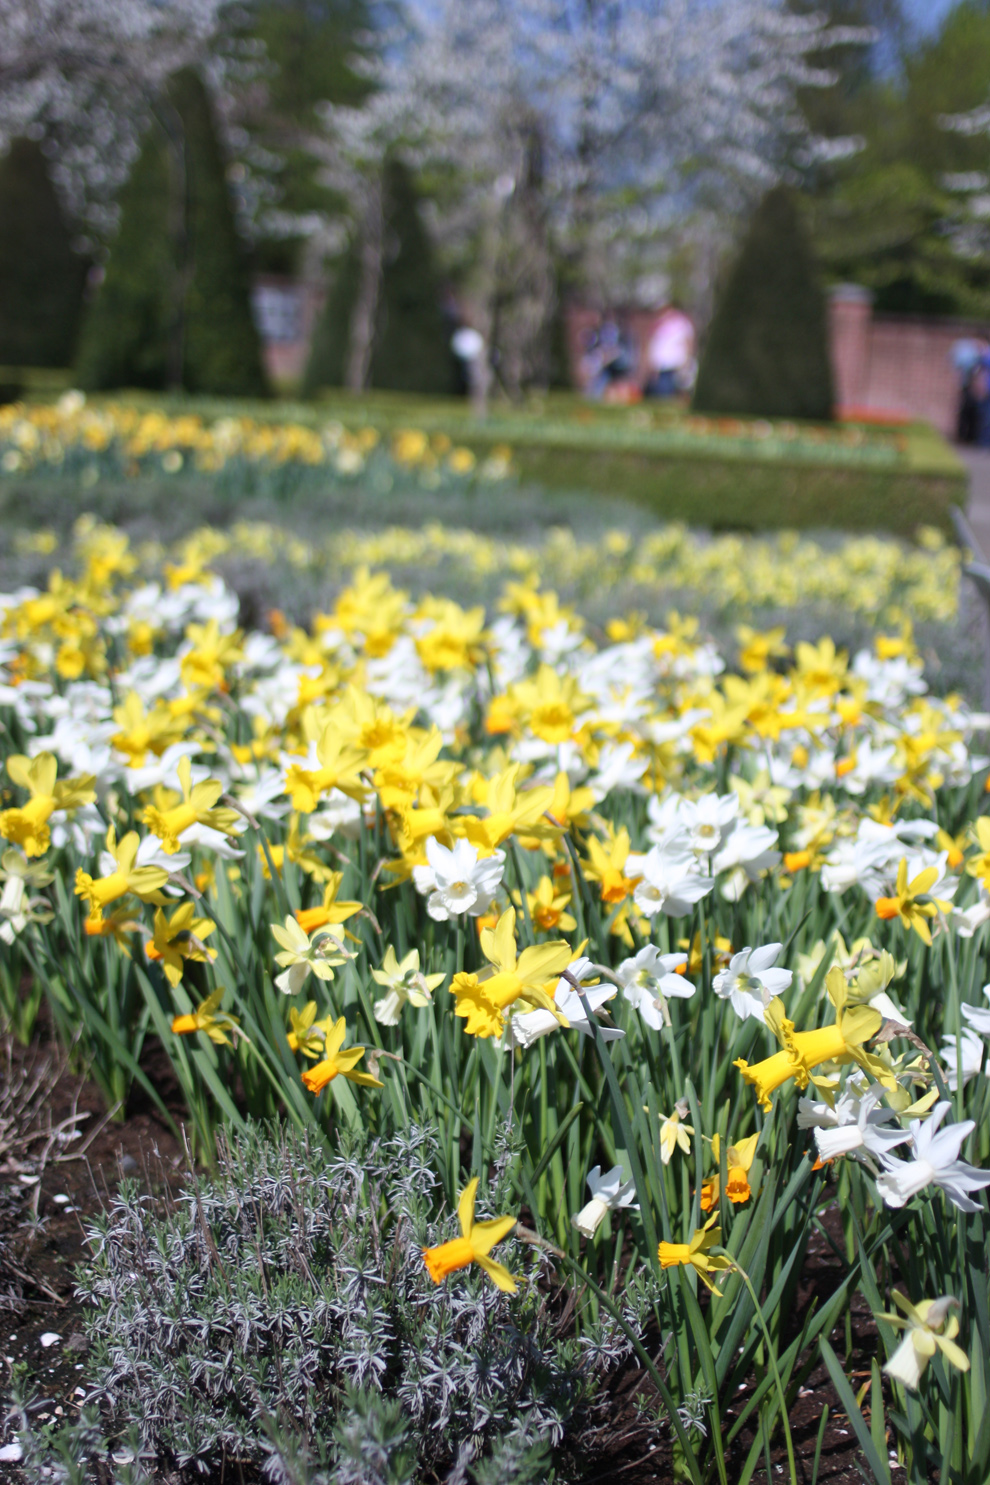 Keukenhof_daffodils_field.jpg